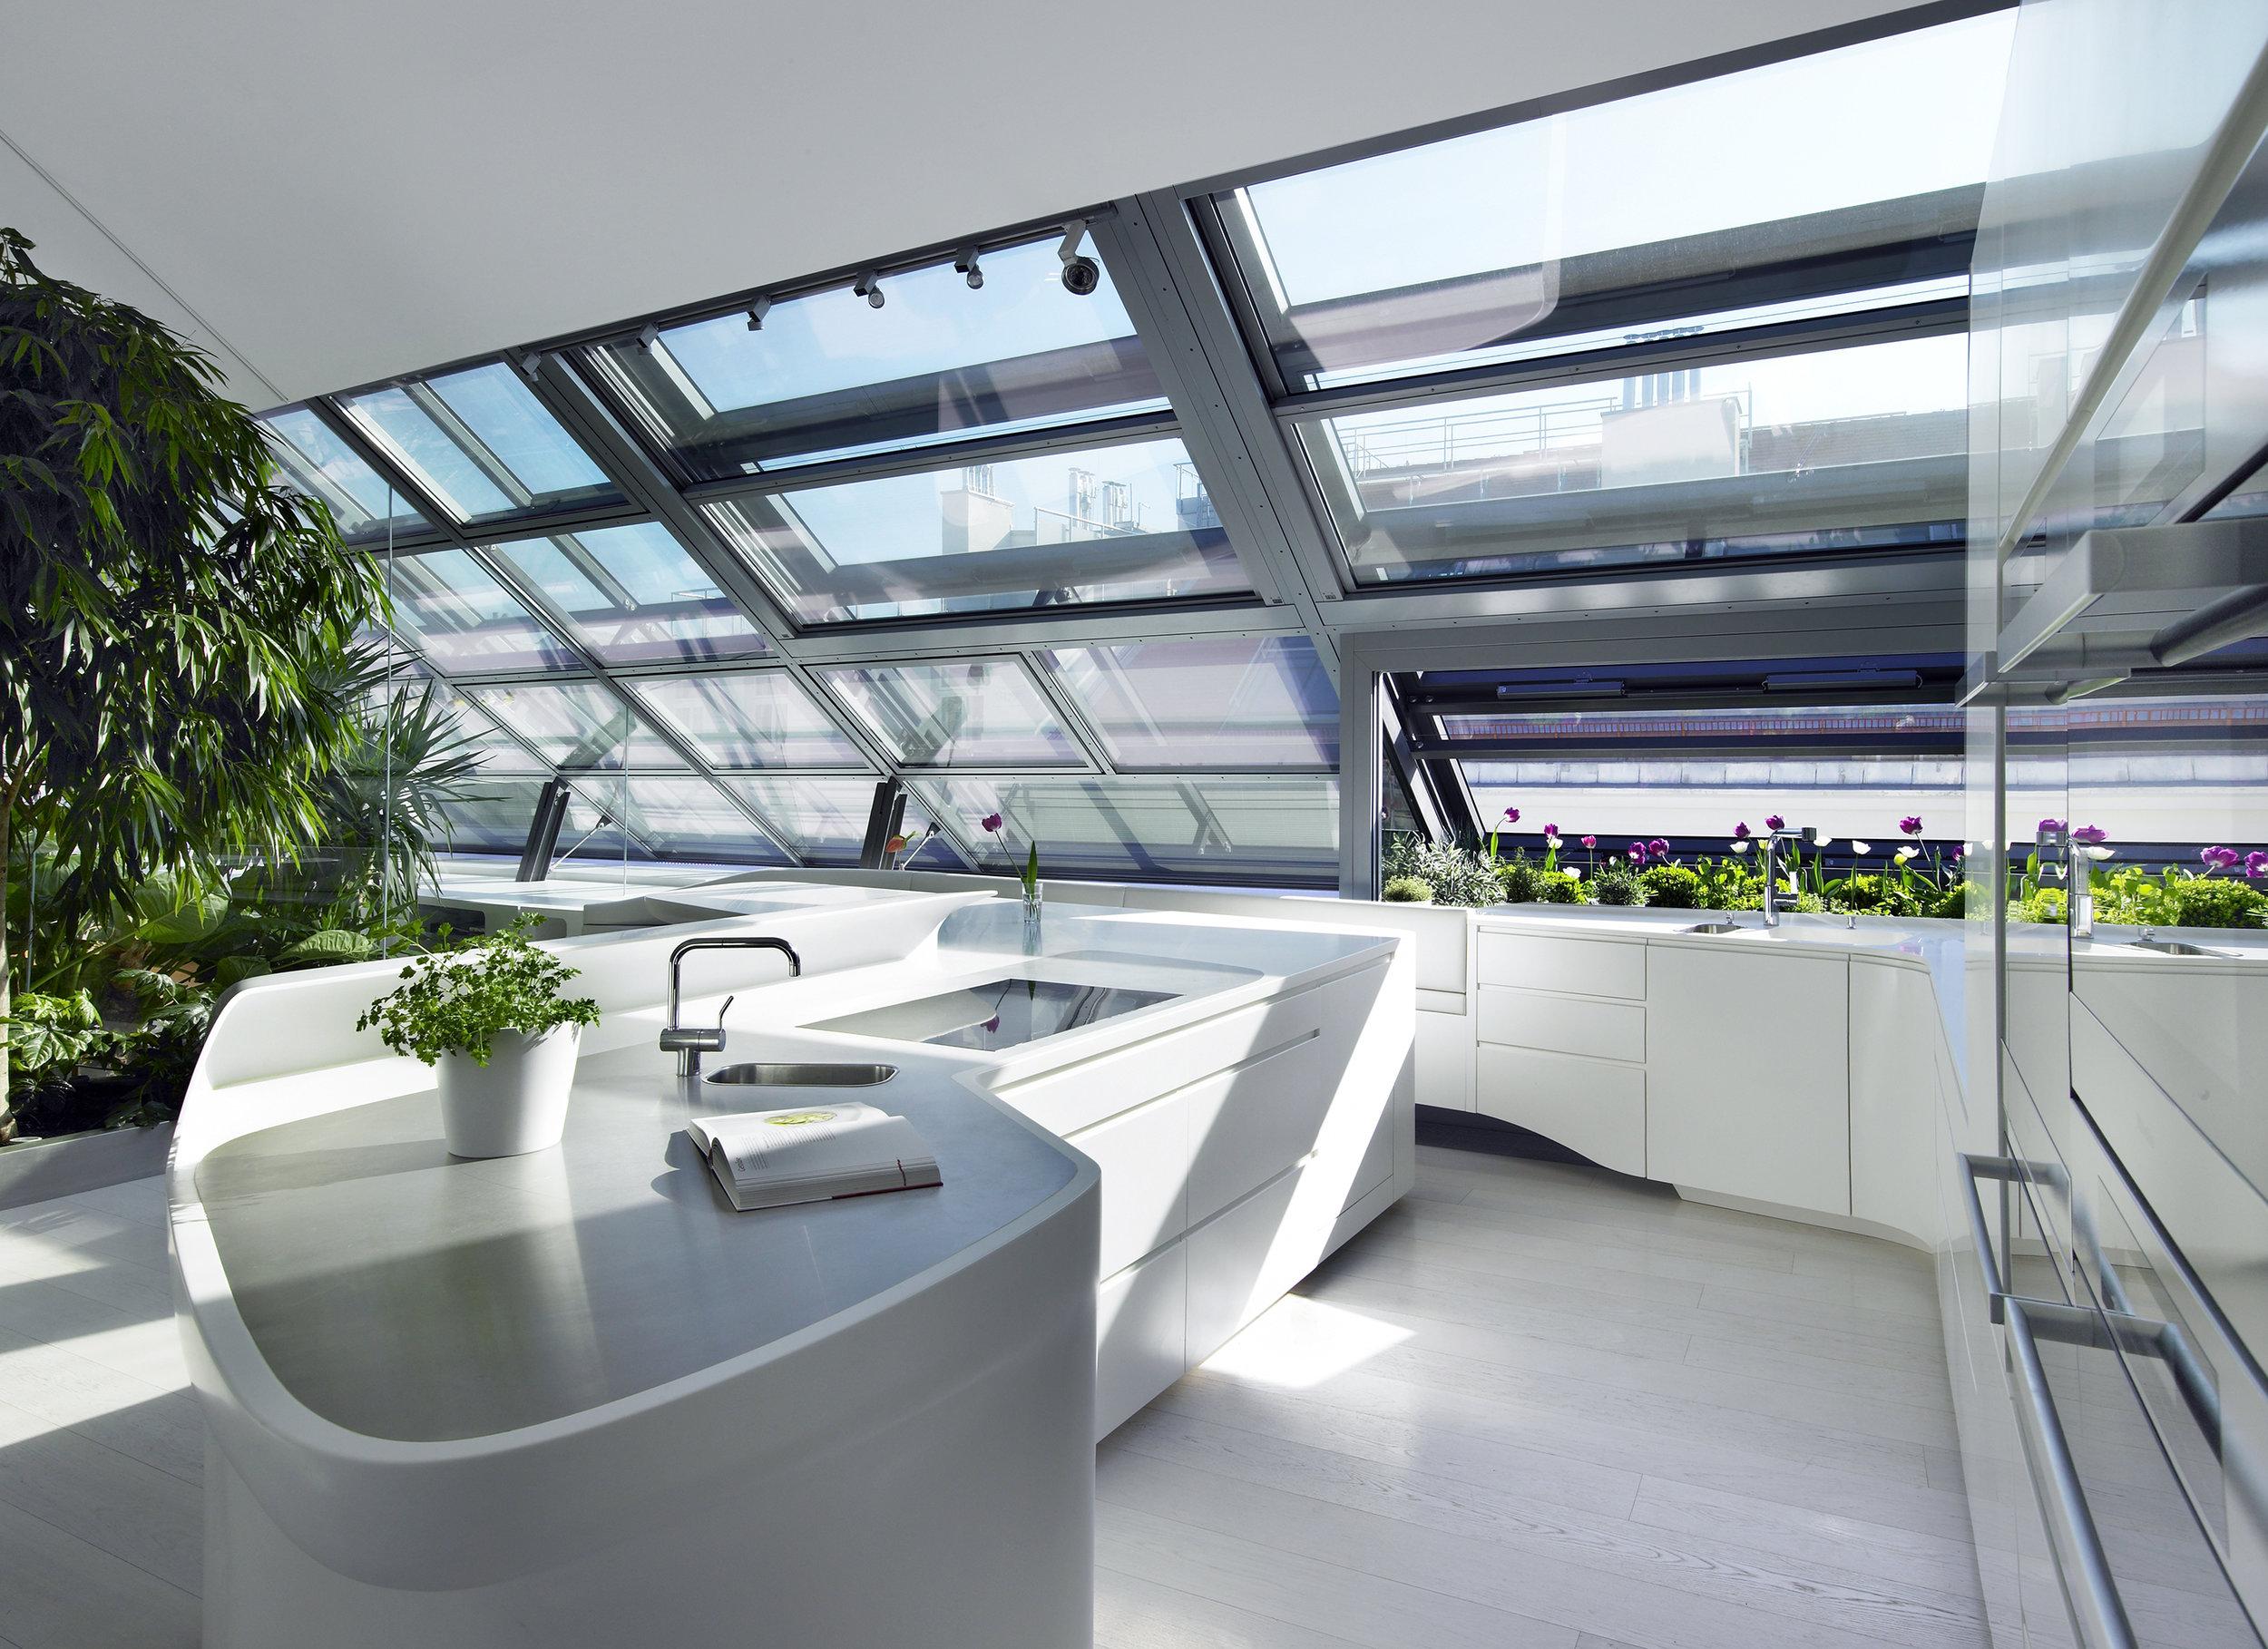 A01 architects - Cityloft_(c)Nadine Blanchard_web06.jpg